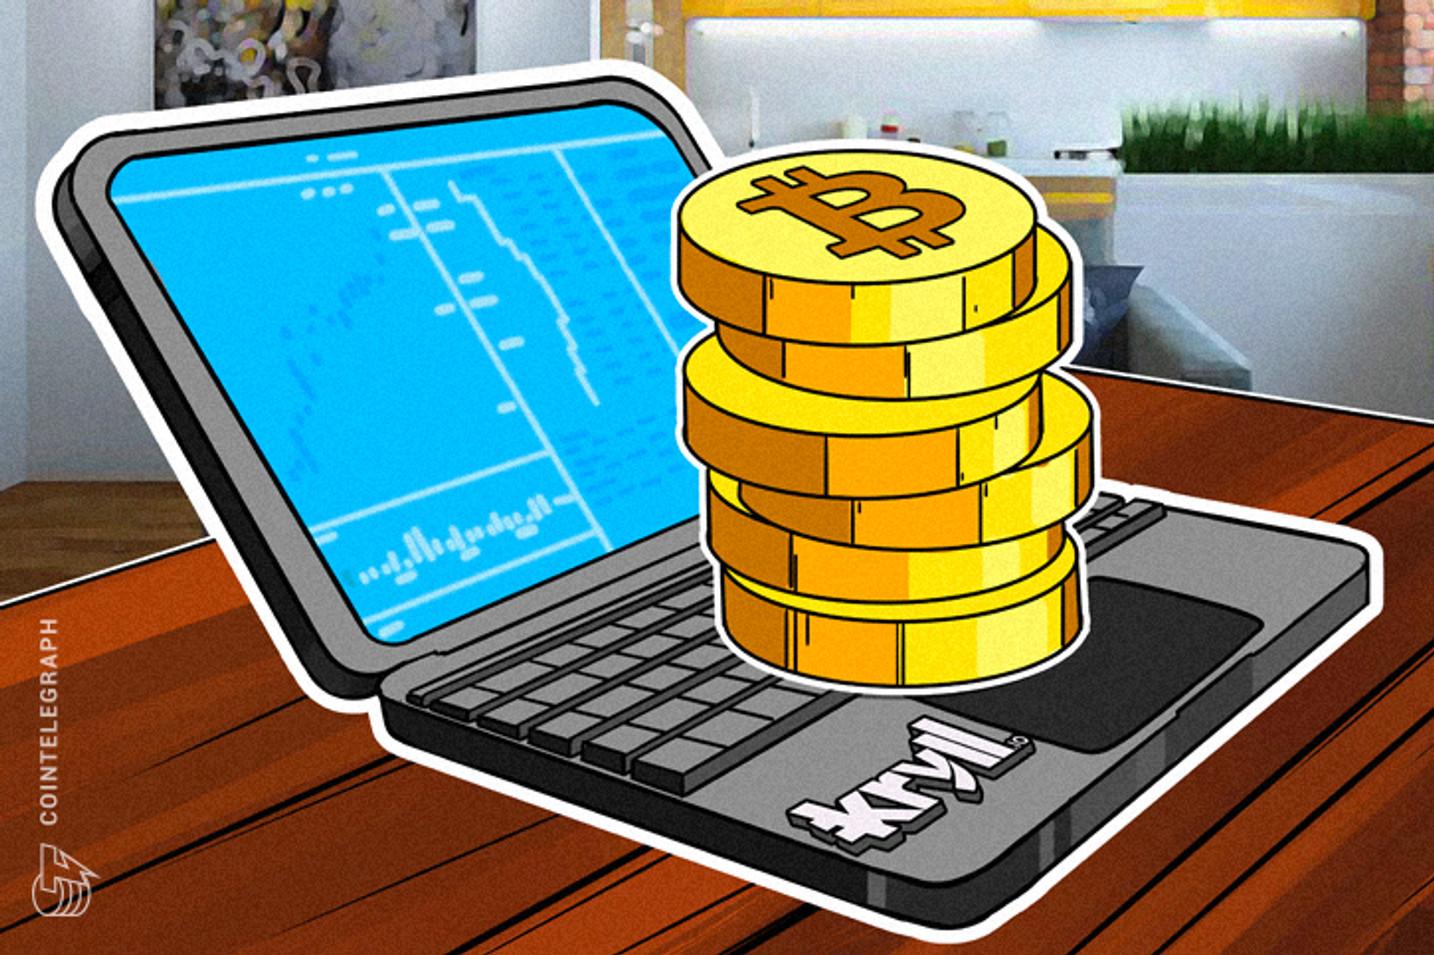 【PR記事】自動化されたトレードで稼ぐ! 仮想通貨の分散型トレーディングプラットフォームを紹介